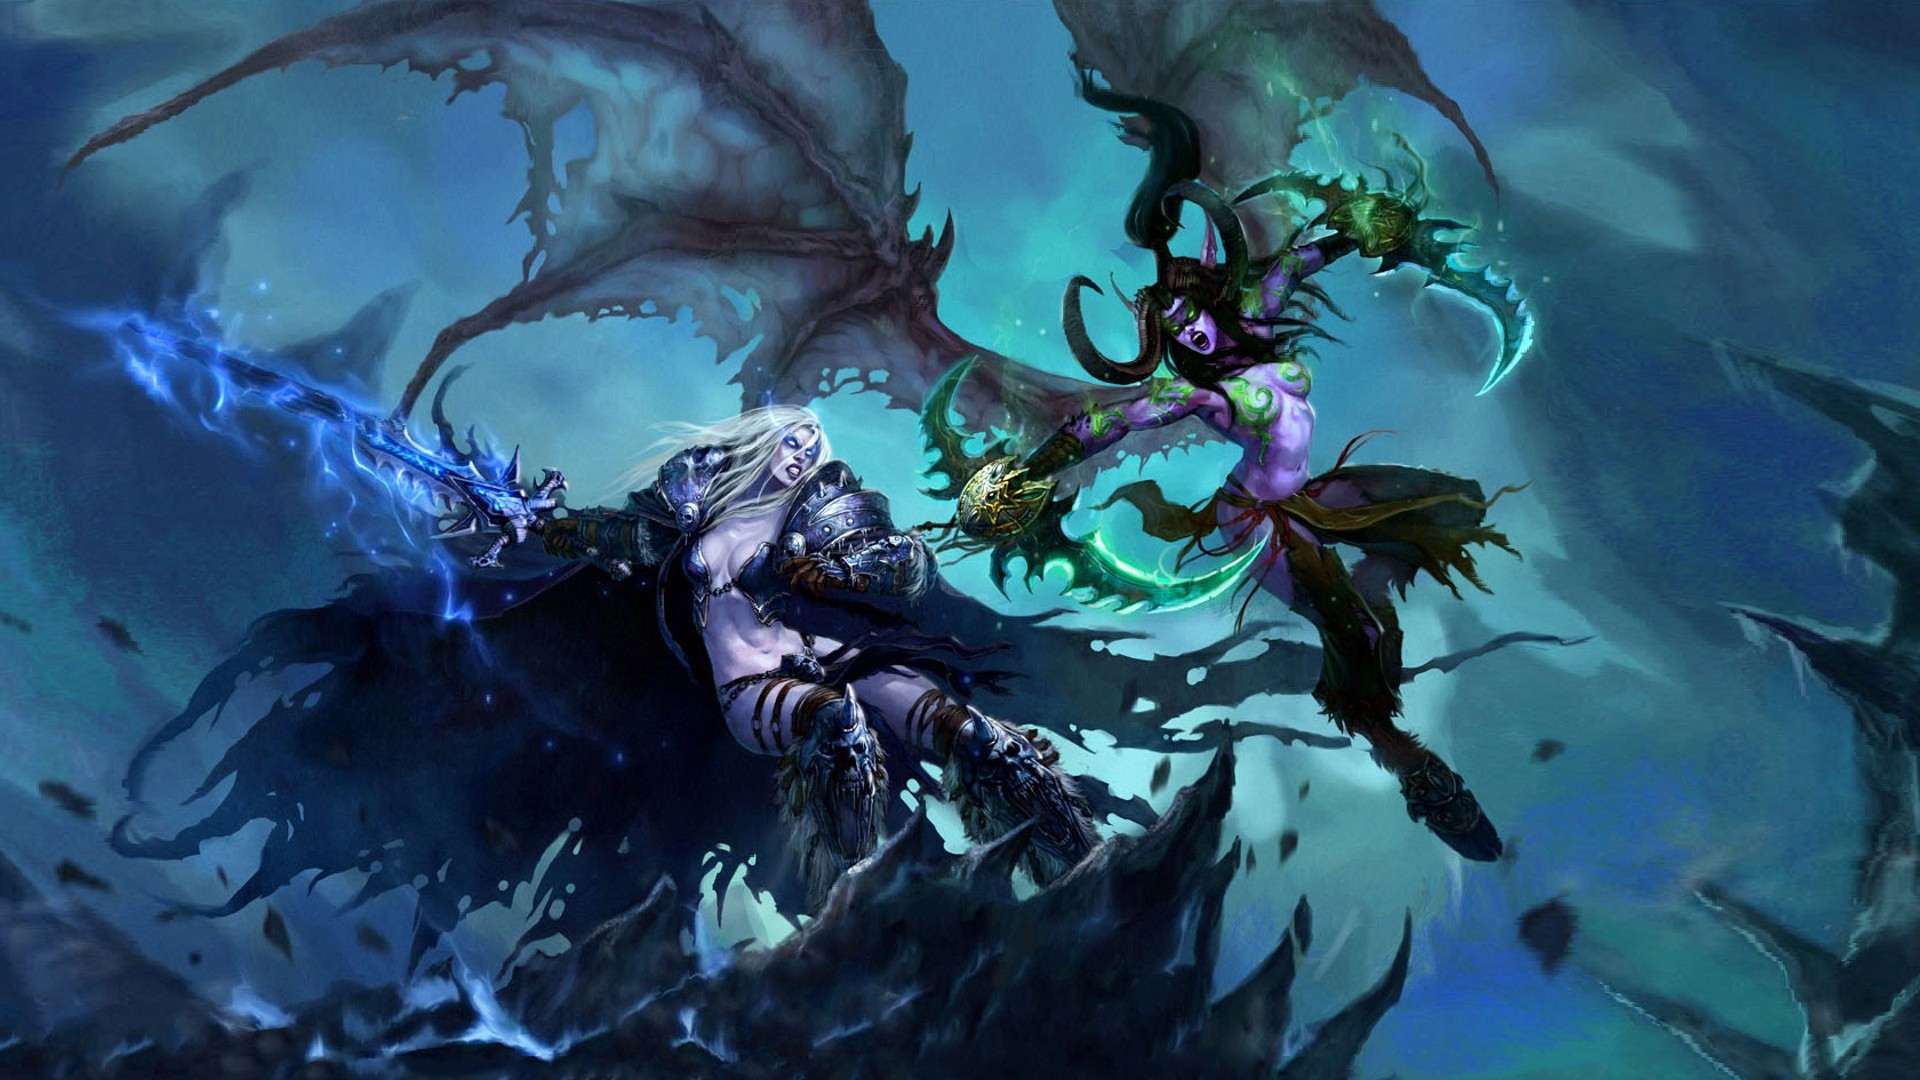 wallpaper death knight · Arthas · Illidan Stormrage · rule 63 · World of  Warcraft